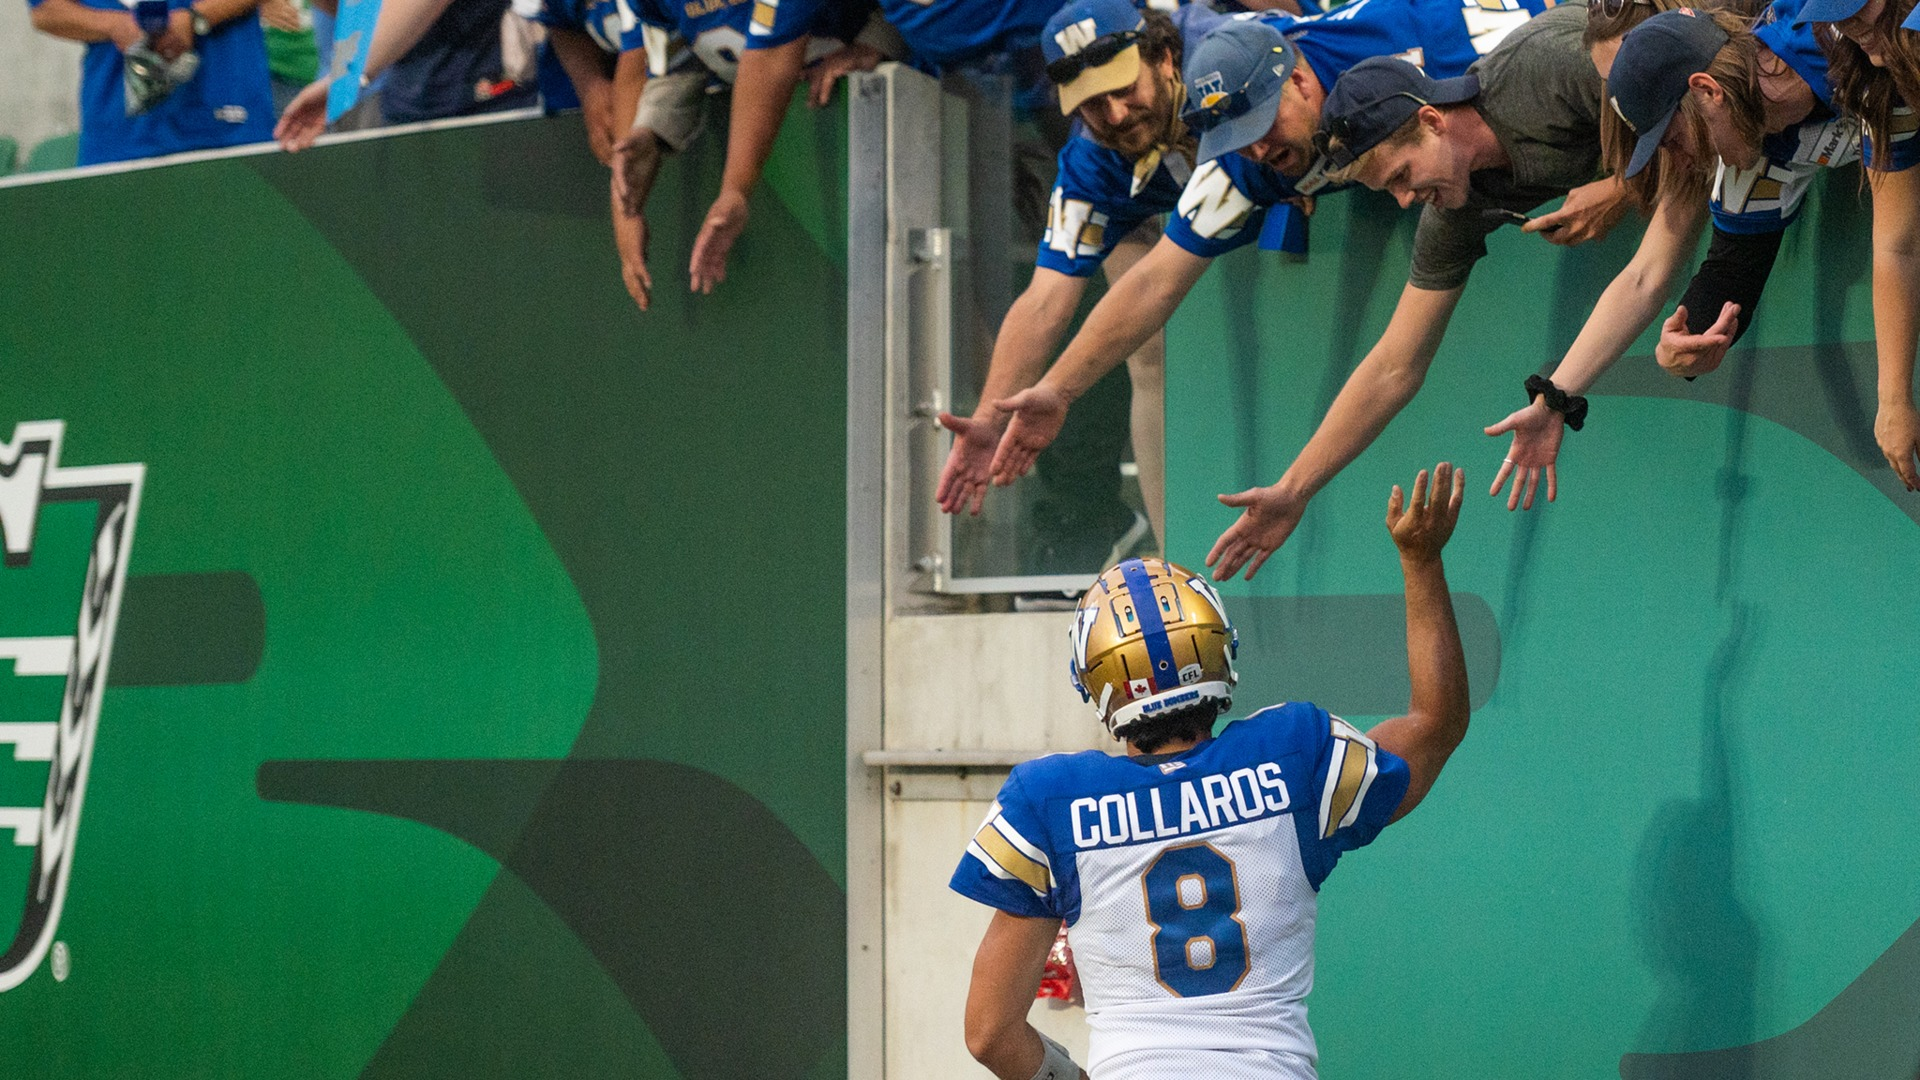 Week 5 Highlights | Winnipeg 23, Saskatchewan 8